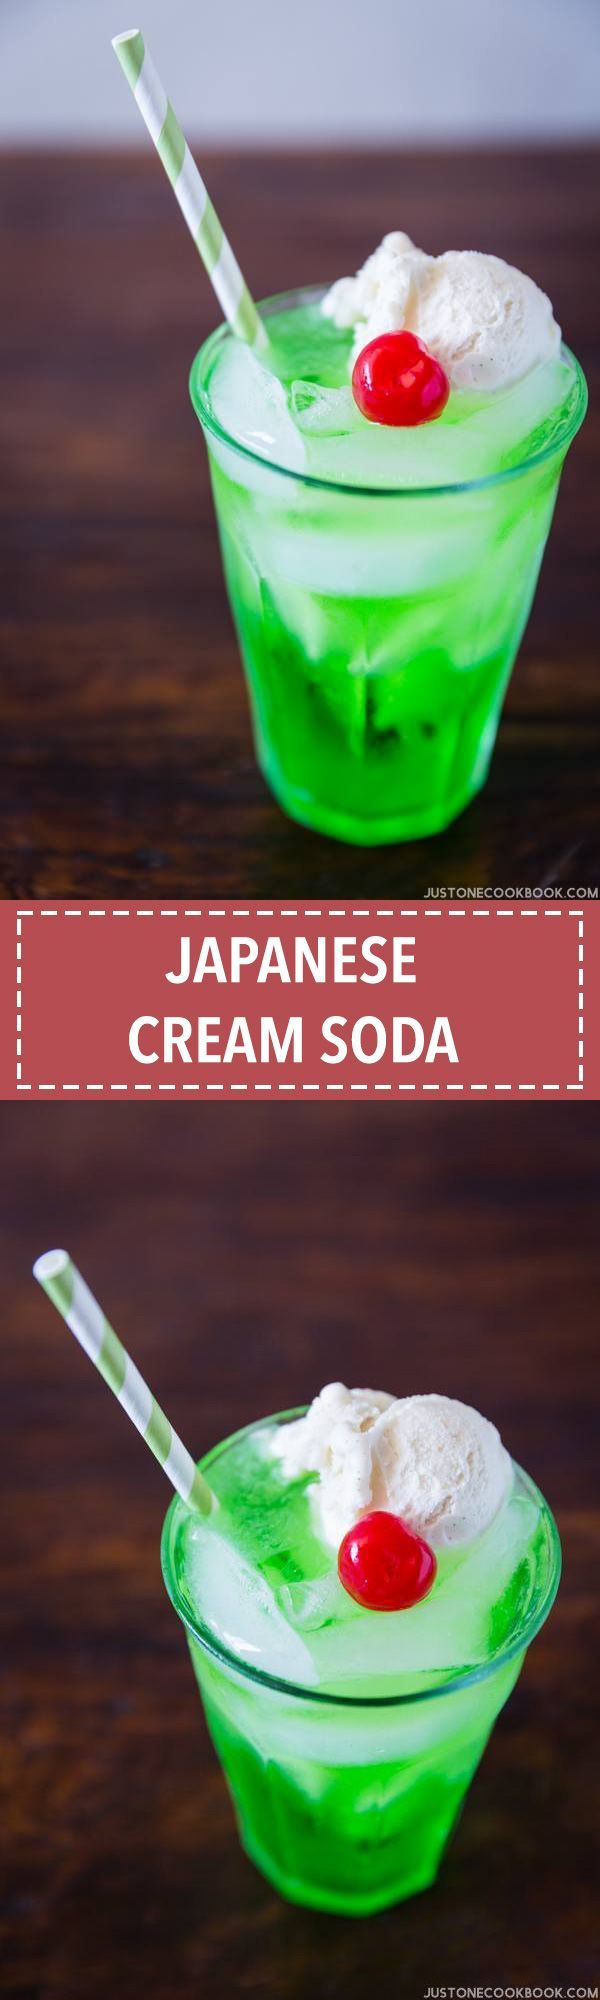 Japanese Cream Soda クリームソーダ | Easy Japanese Recipes at JustOneCookbook.com